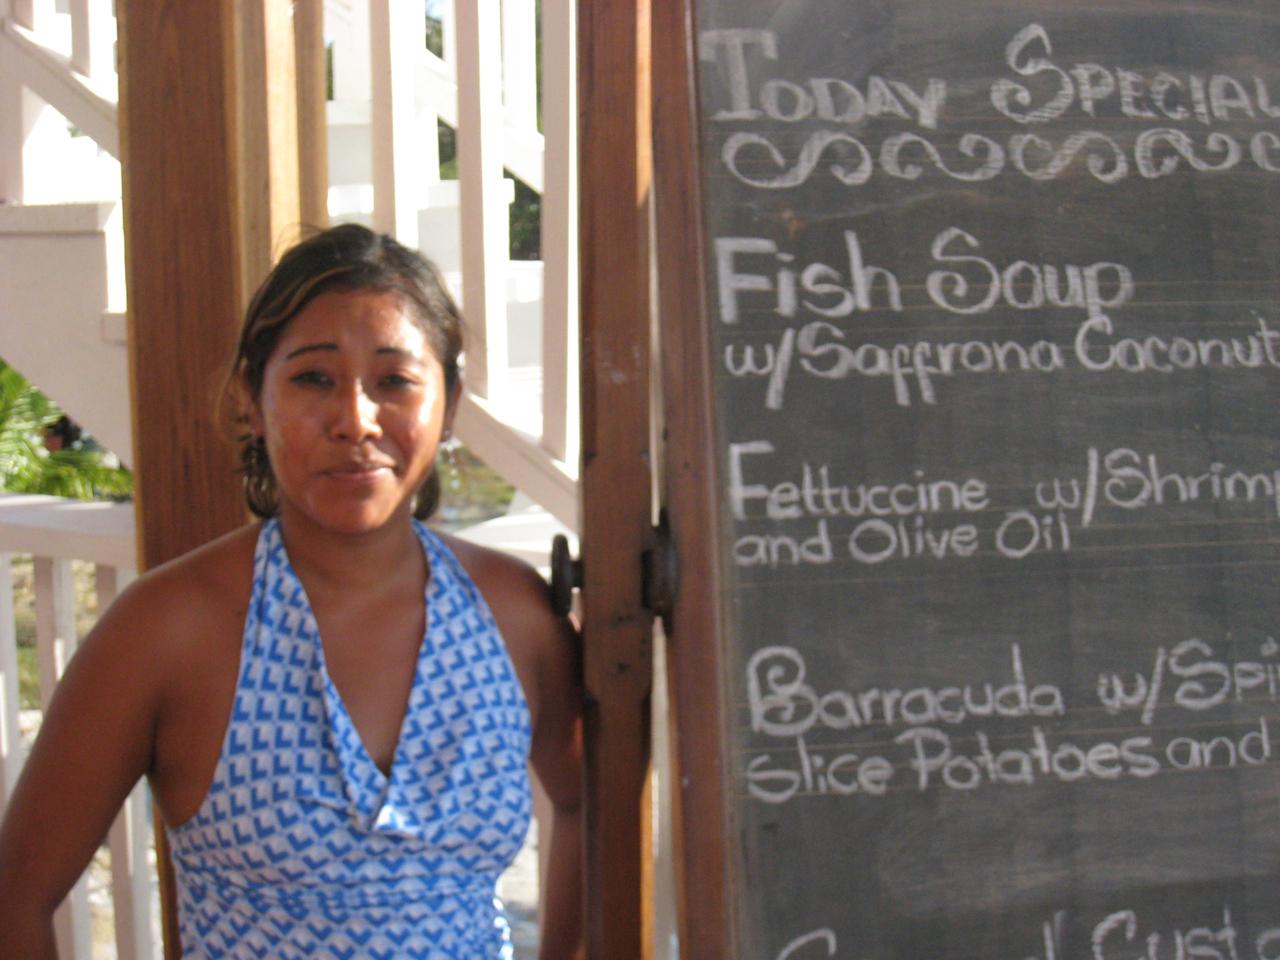 Seafood Specials at Driftwood Lodge, Caye Caulker, Belize